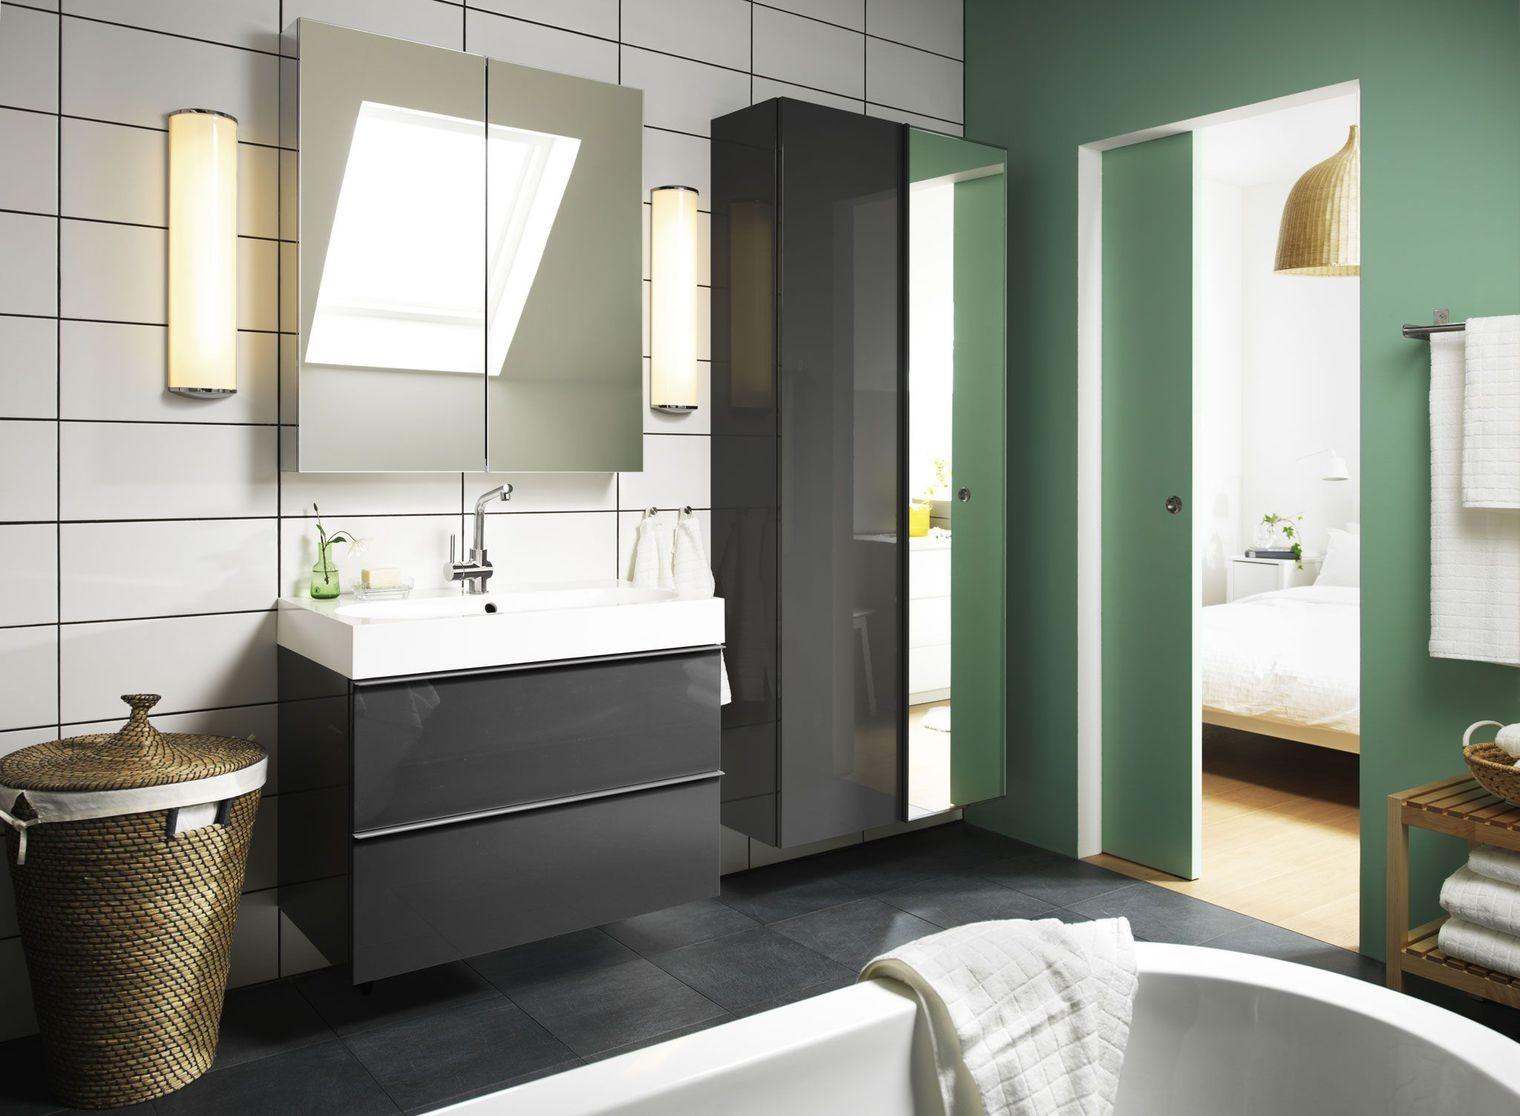 Armoire salle de bain ikea armoire id es de d coration for Petit meuble de salle de bain ikea